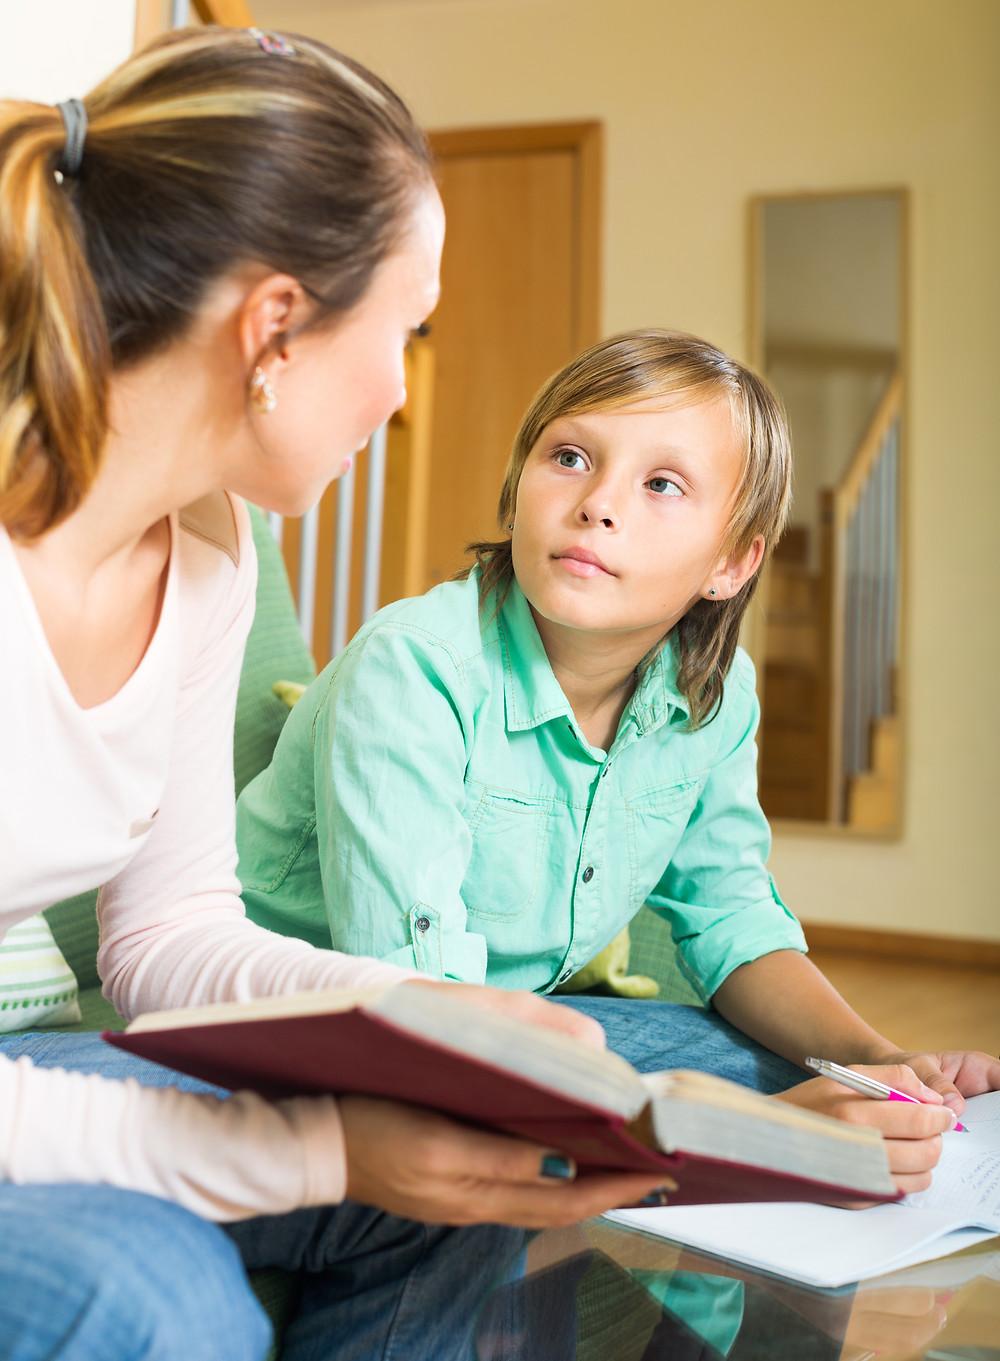 "<a href=""https://www.freepik.com/free-photos-vectors/school"">School photo created by bearfotos - www.freepik.com</a>"